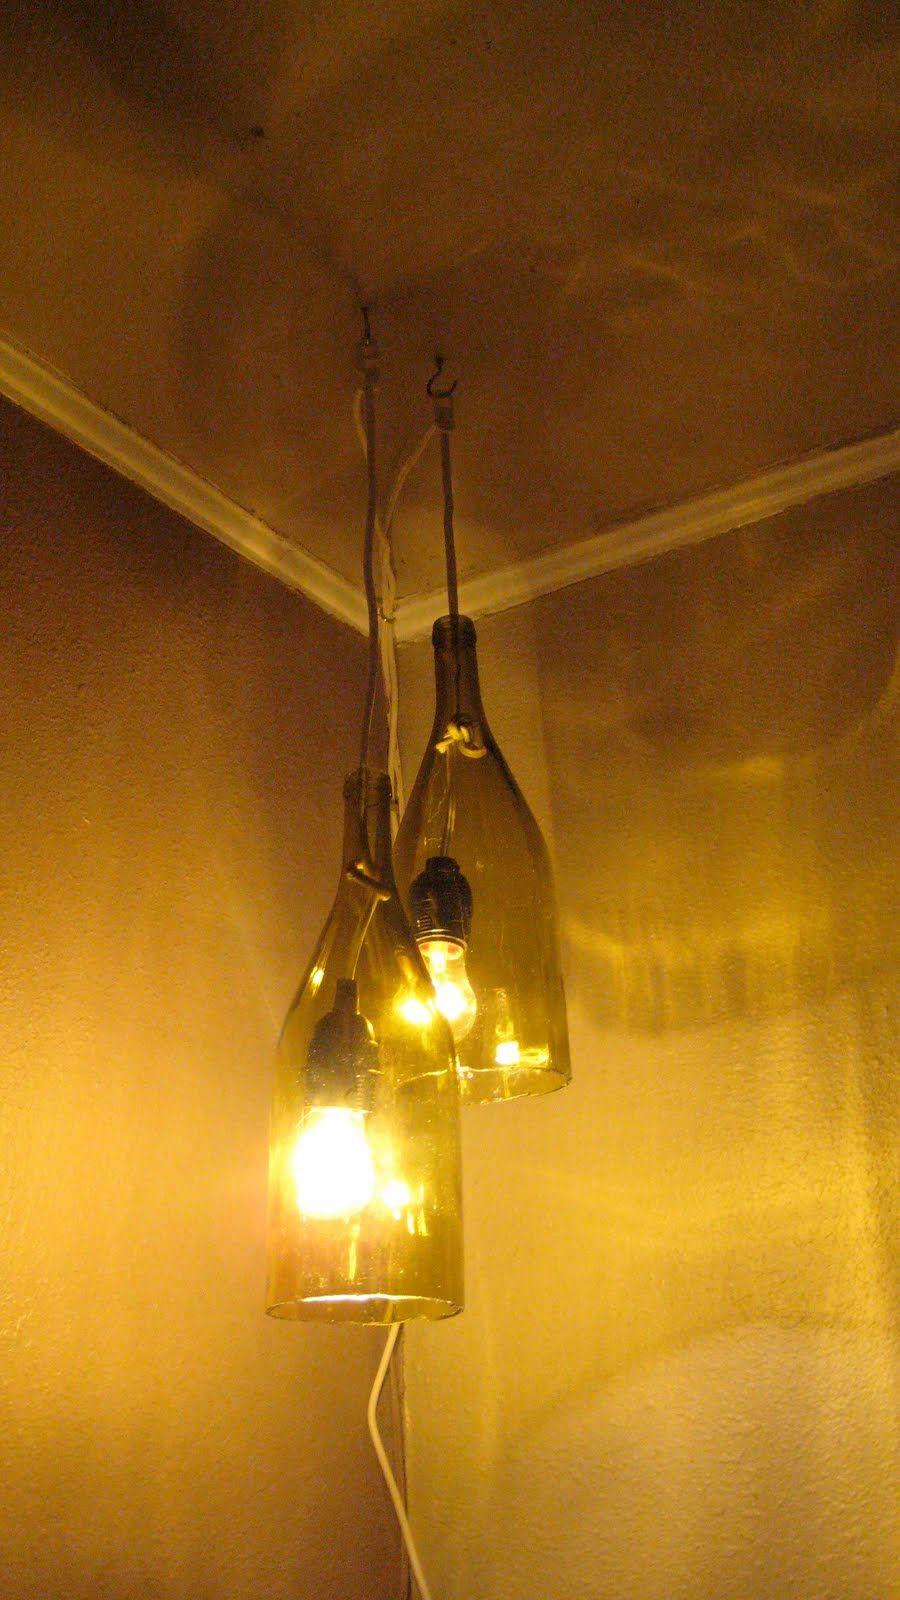 Diy ways to achieve the perfect lighting pendant lighting bottle diy ways to achieve the perfect lighting wine bottle arubaitofo Image collections